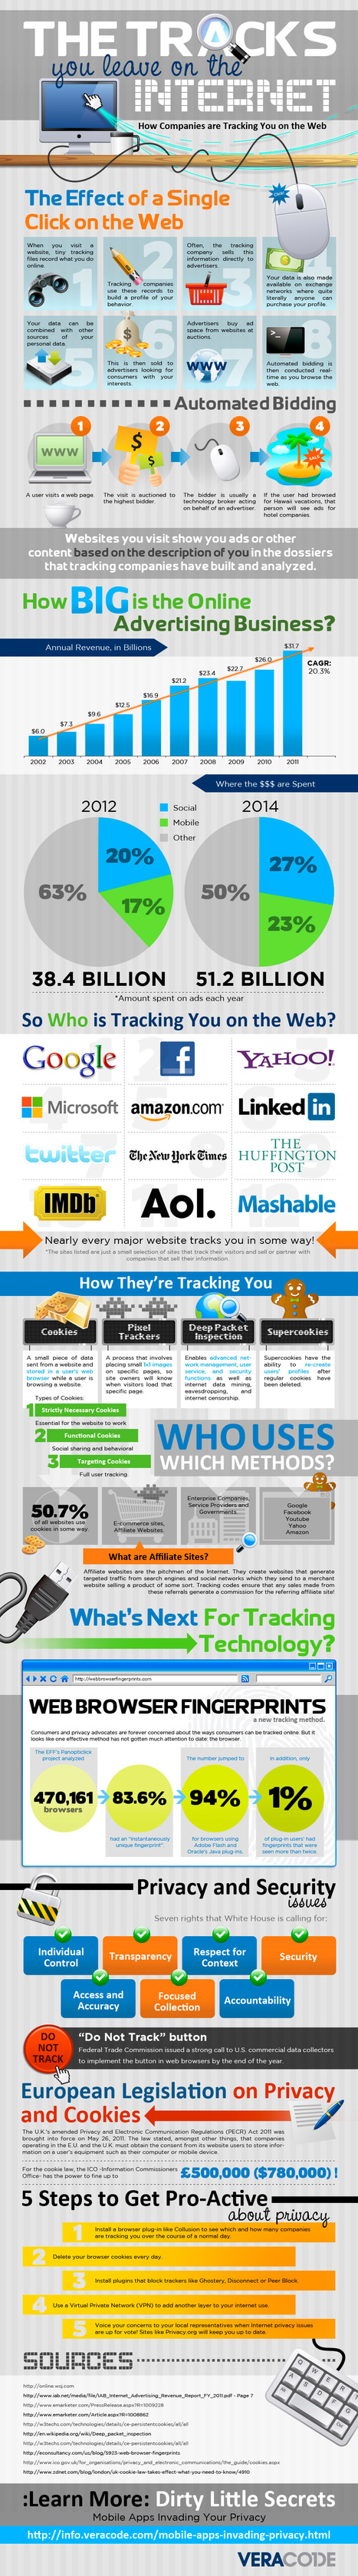 How Companies Track You on the Web [Infographic] | Ciberseguridad + Inteligencia | Scoop.it